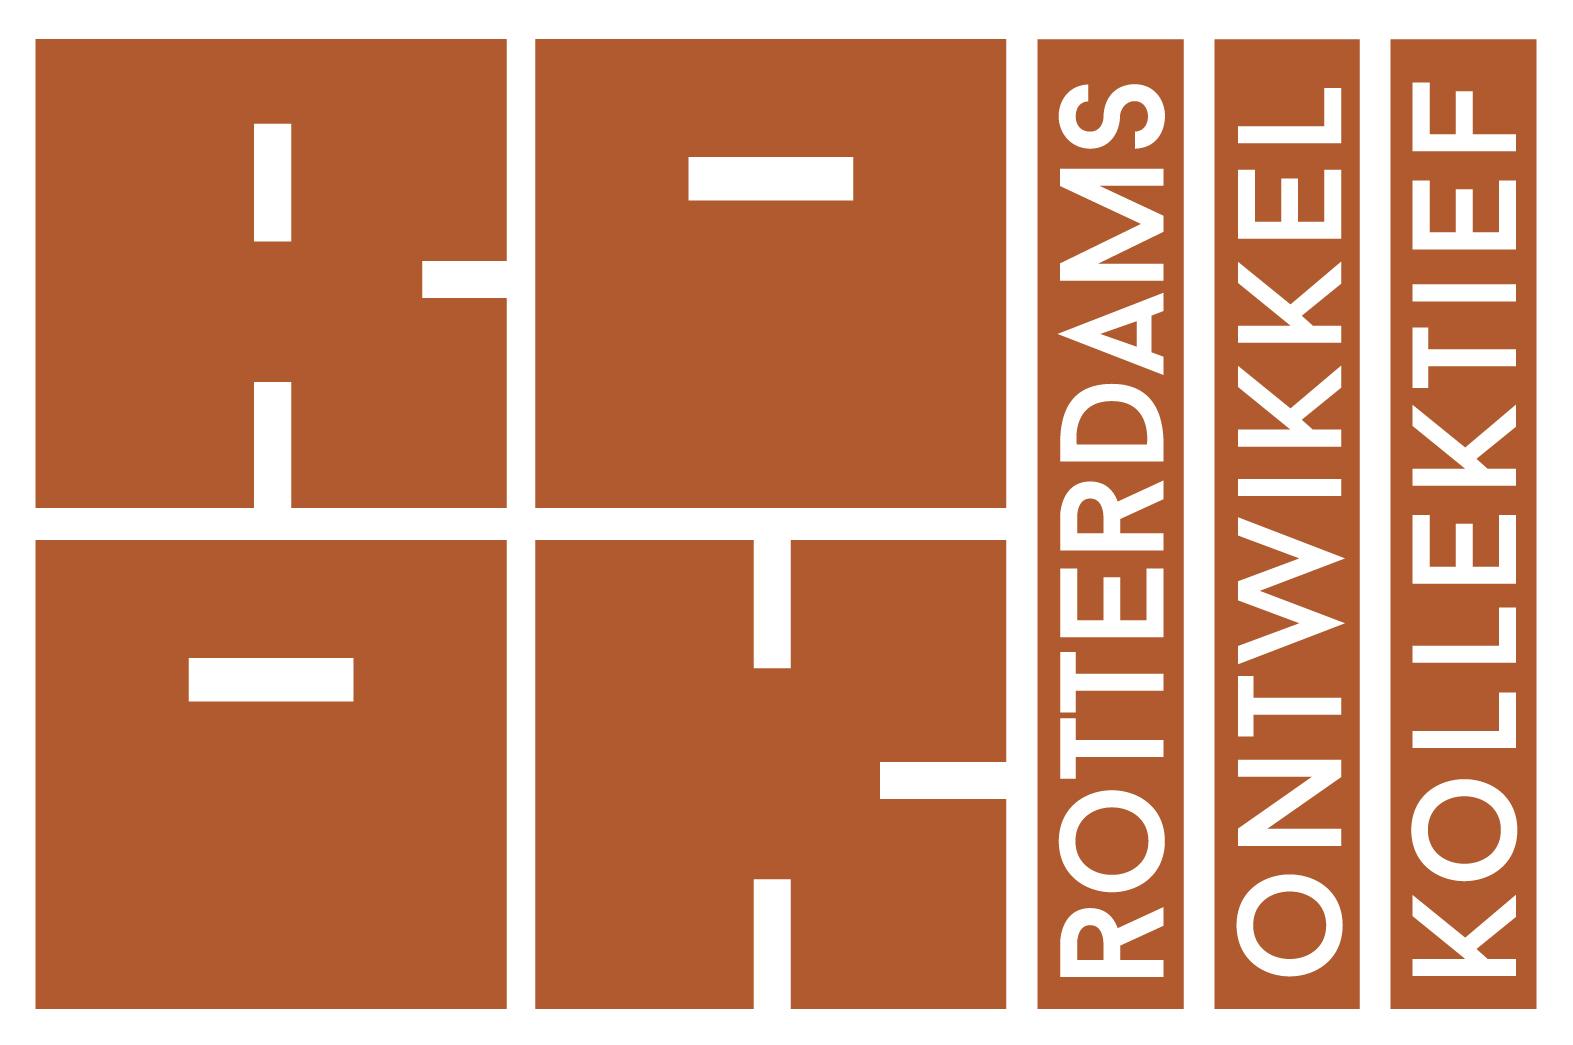 Rotterdams Ontwikkel Kollektief